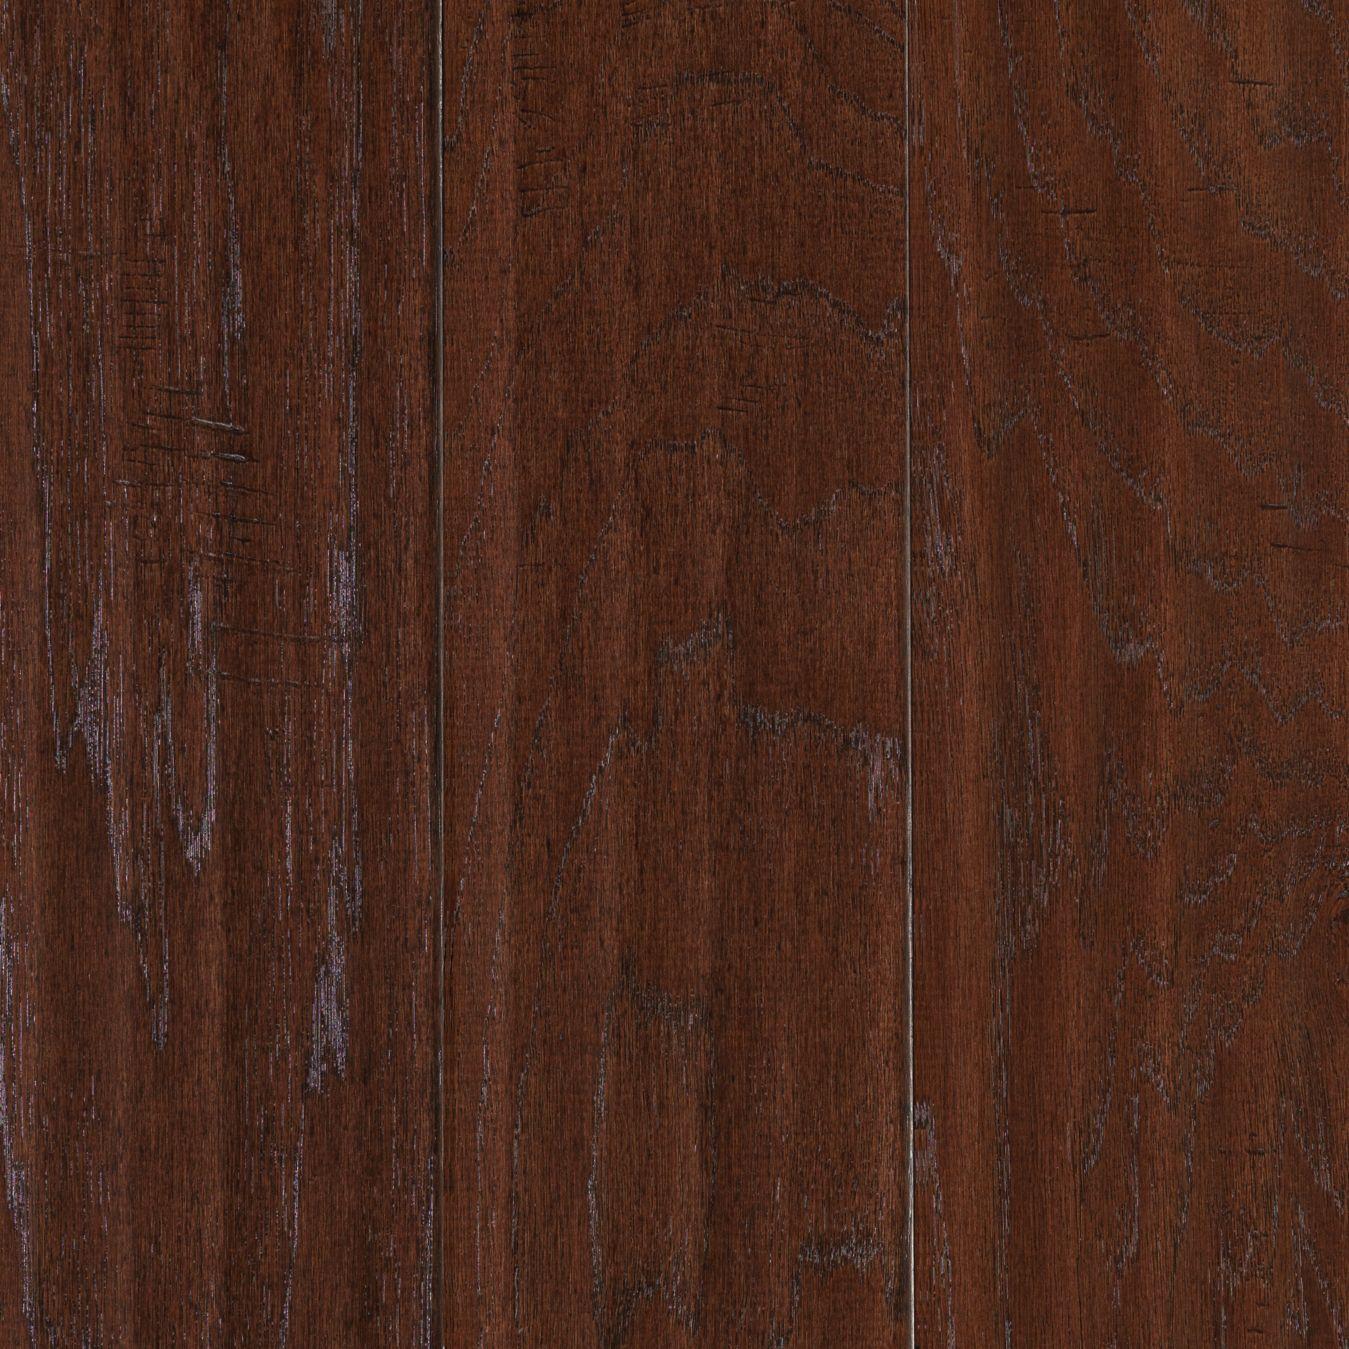 Hardwood Barnhill MEC52-11 HickoryChocolate